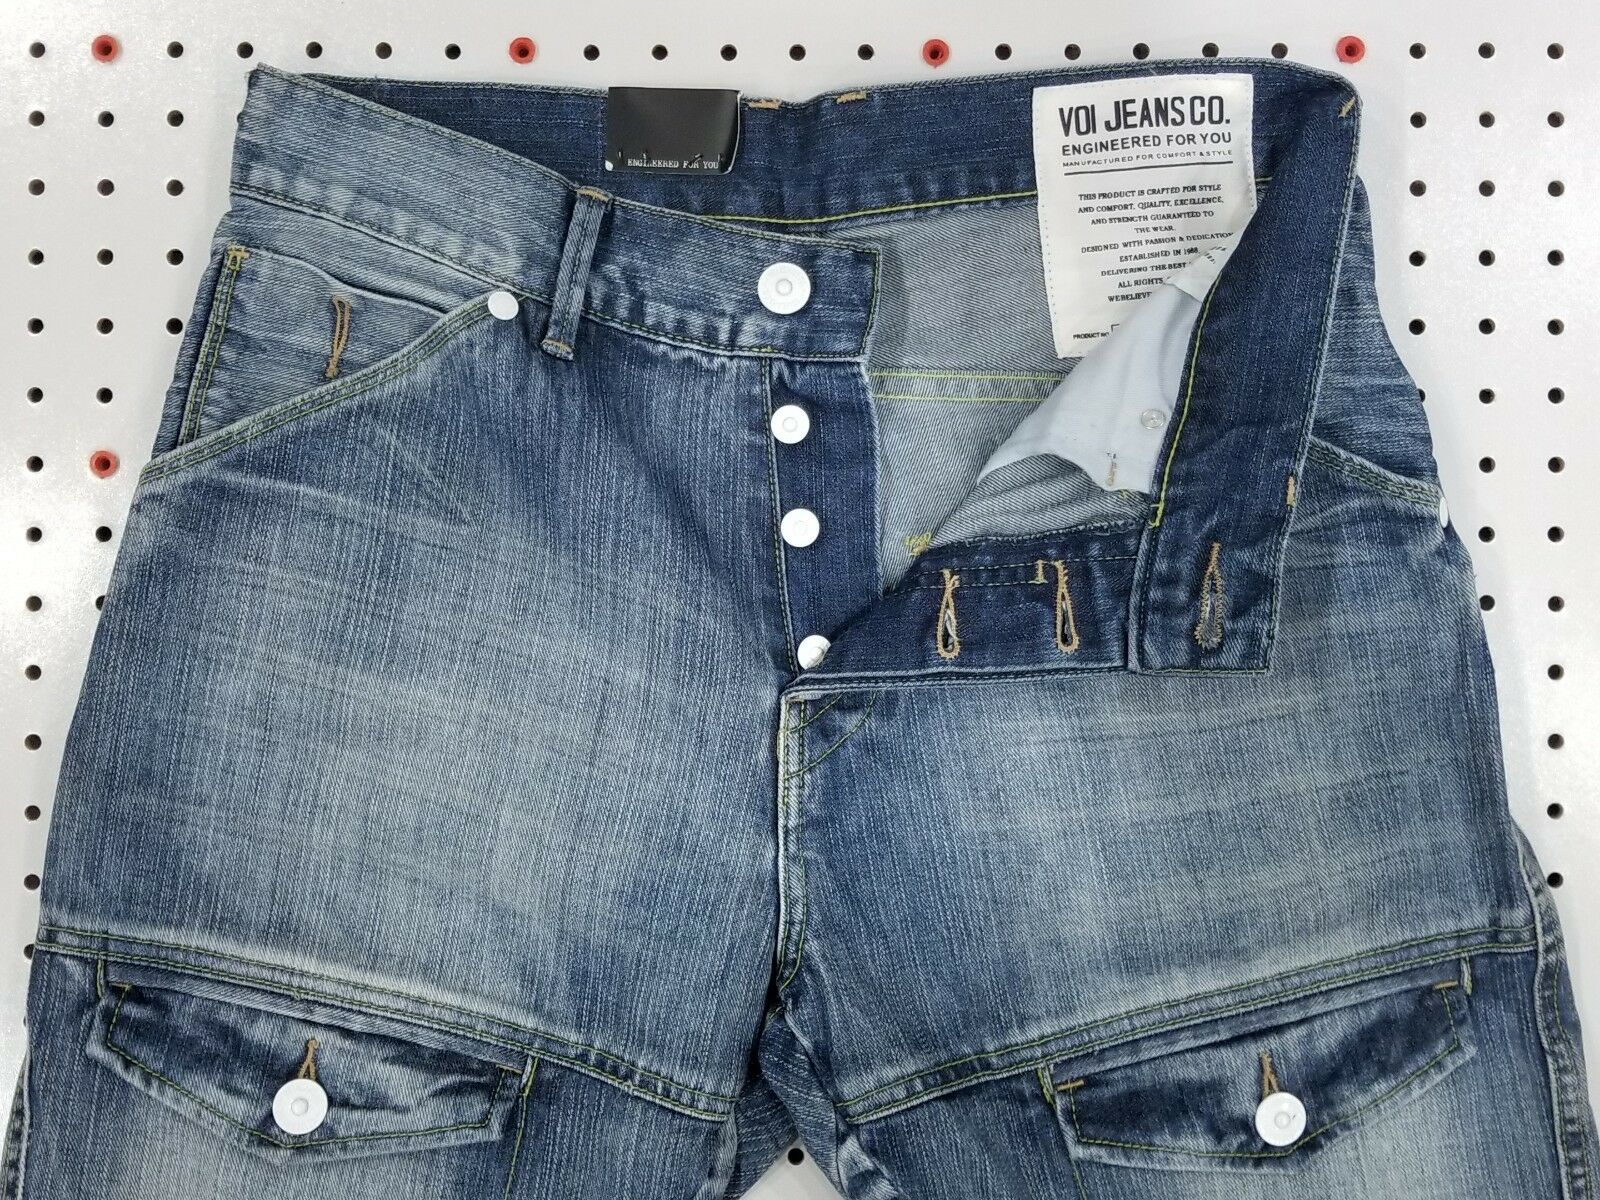 NWT Designer Jeans by VOI   Twisted Broken-In Non-Distressed HIGE Hi-Q Denim v4